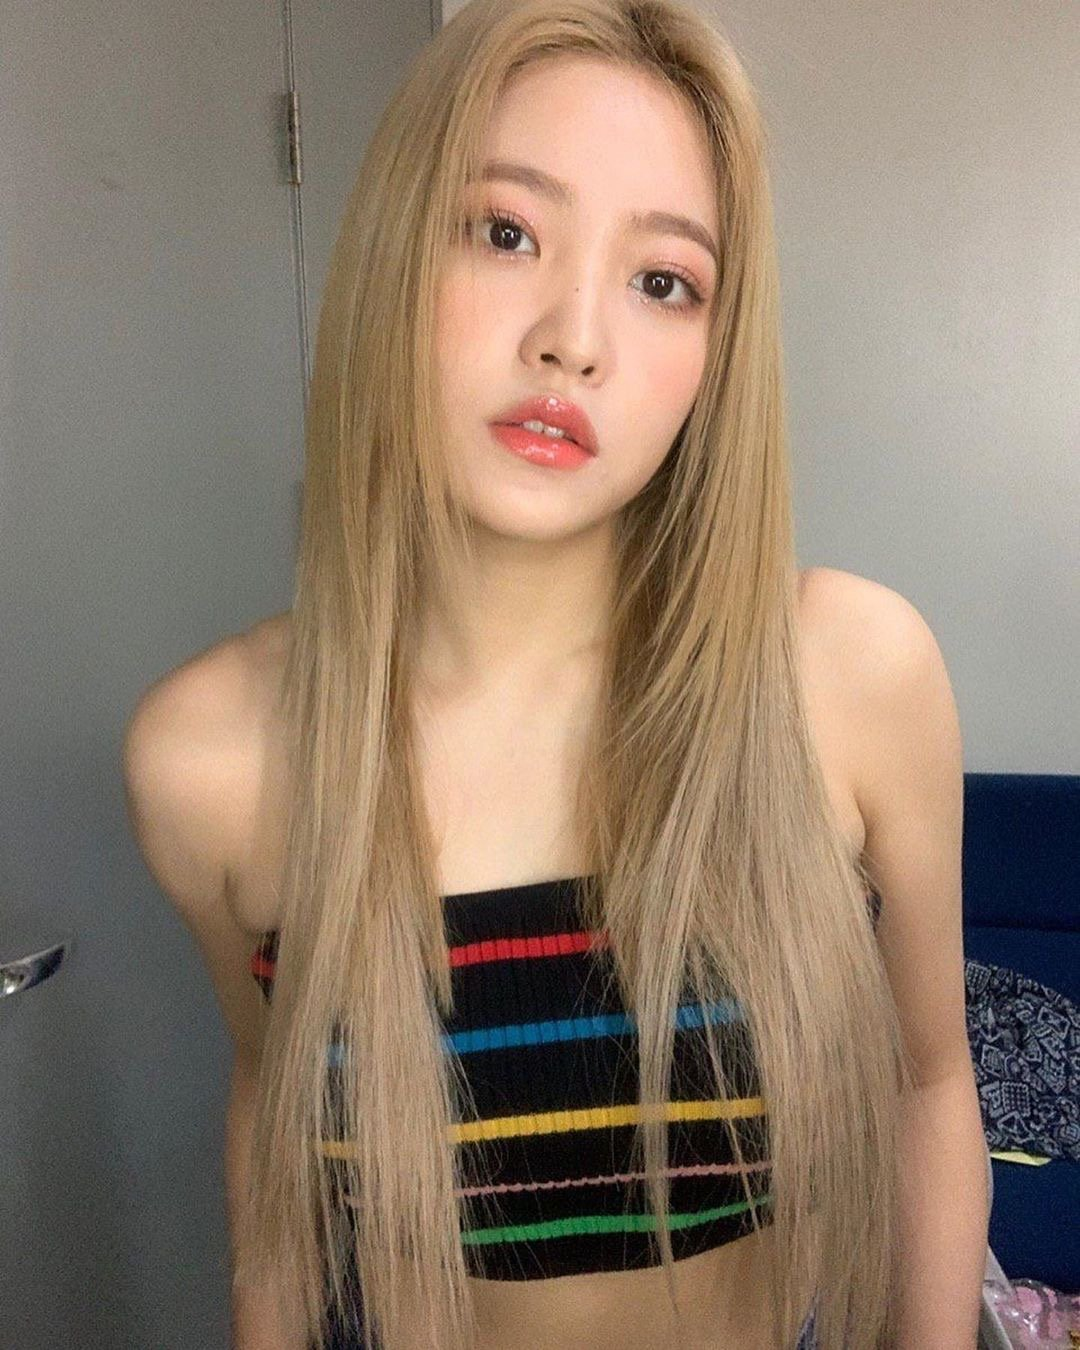 [Red Velvet][分享]190825 帅气的性感,金发YERI用脸鲨人!